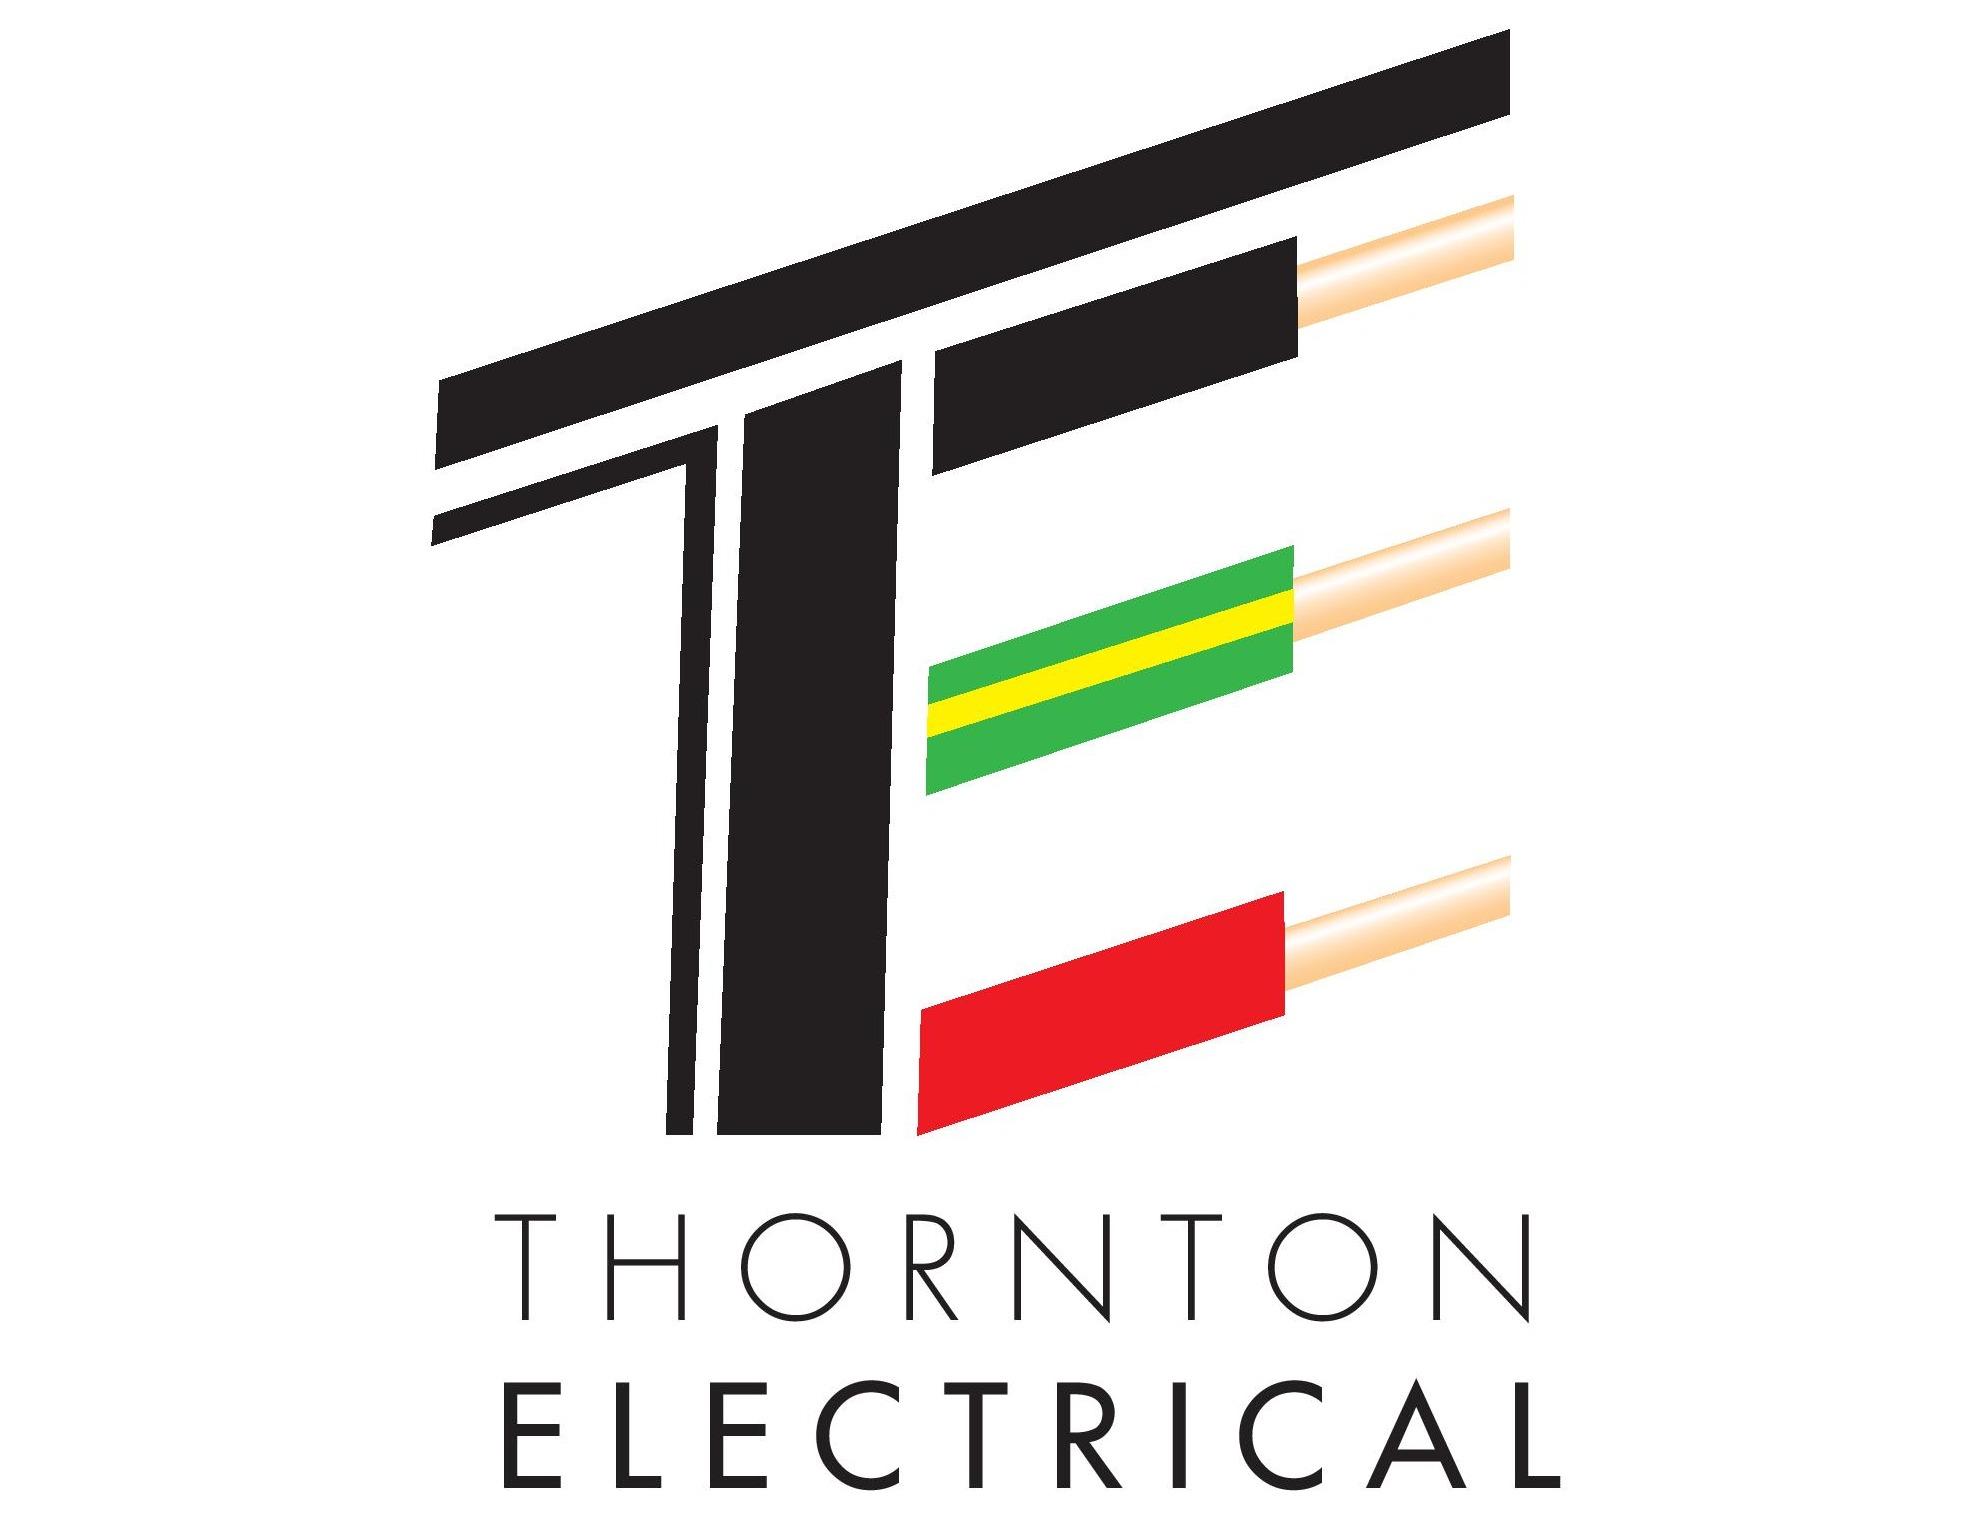 Thornton Electrical